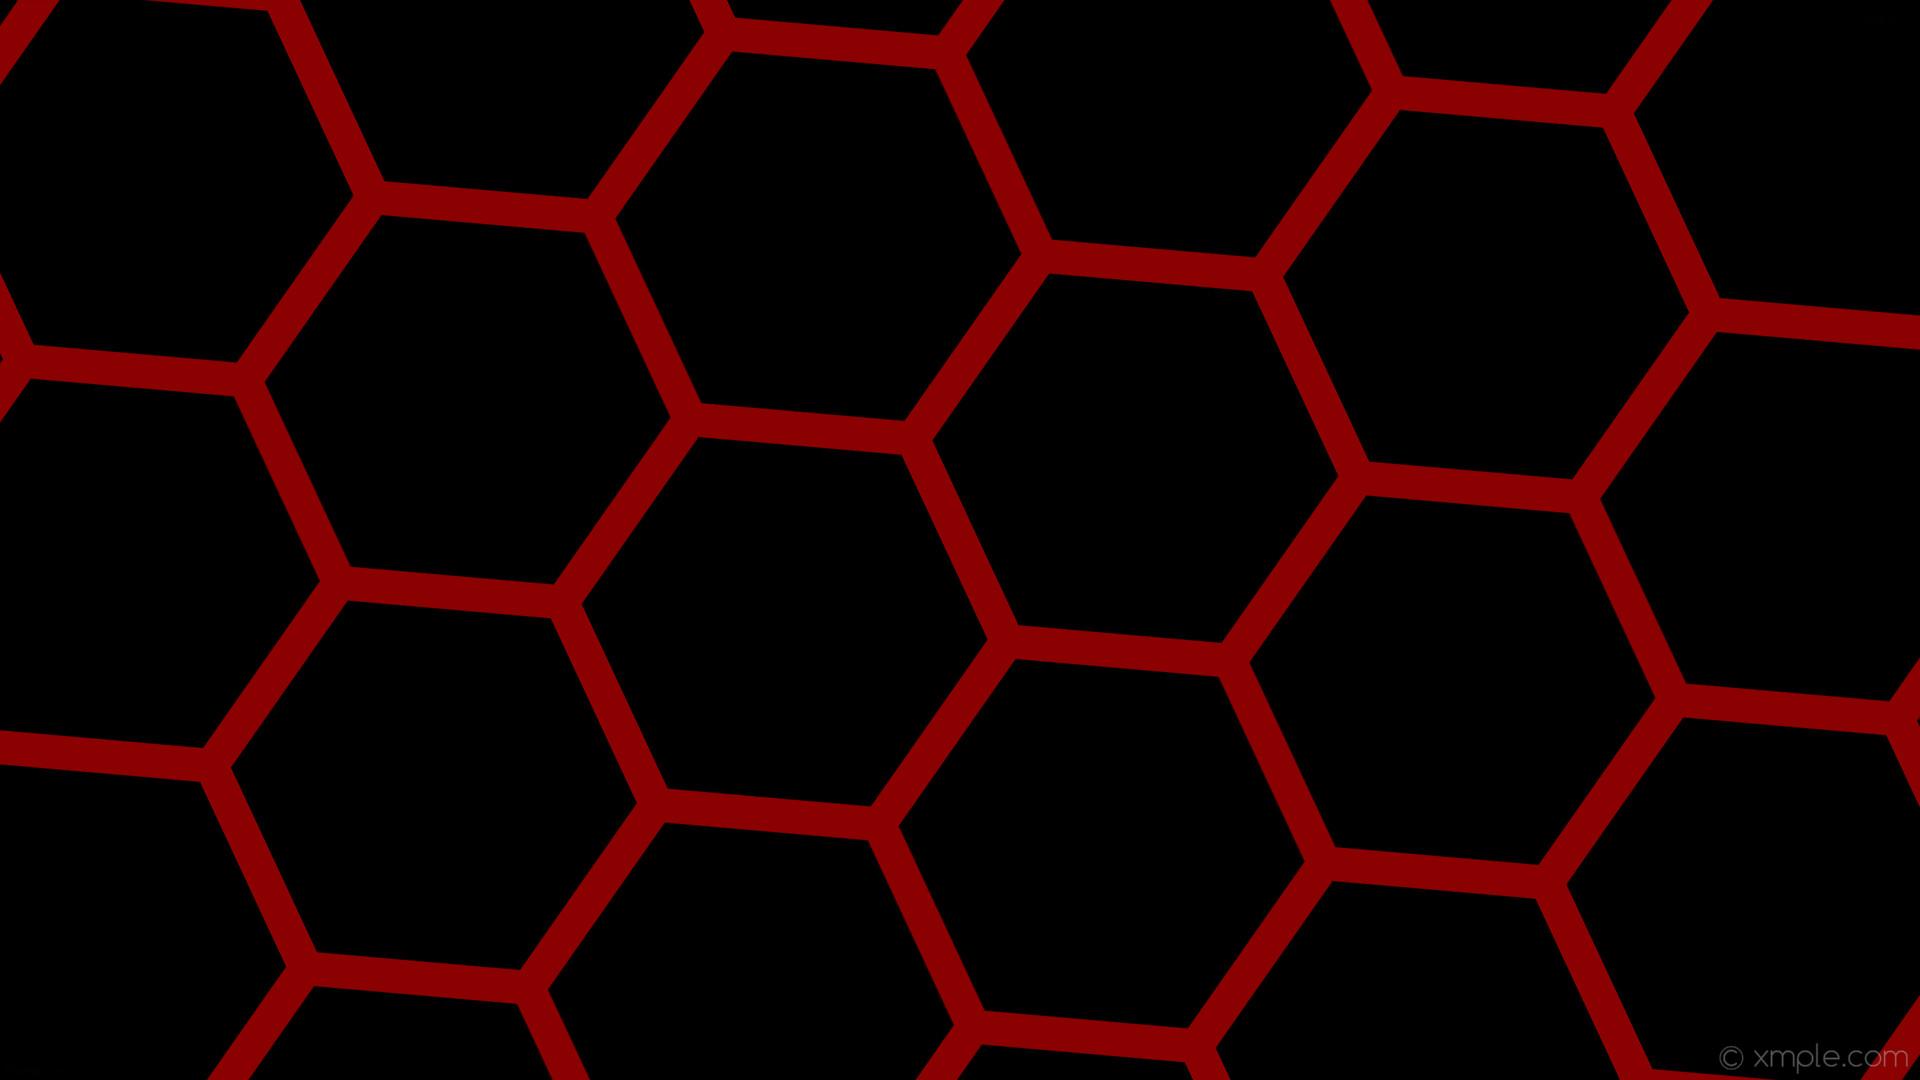 wallpaper beehive honeycomb black red hexagon dark red #000000 #8b0000  diagonal 25° 34px